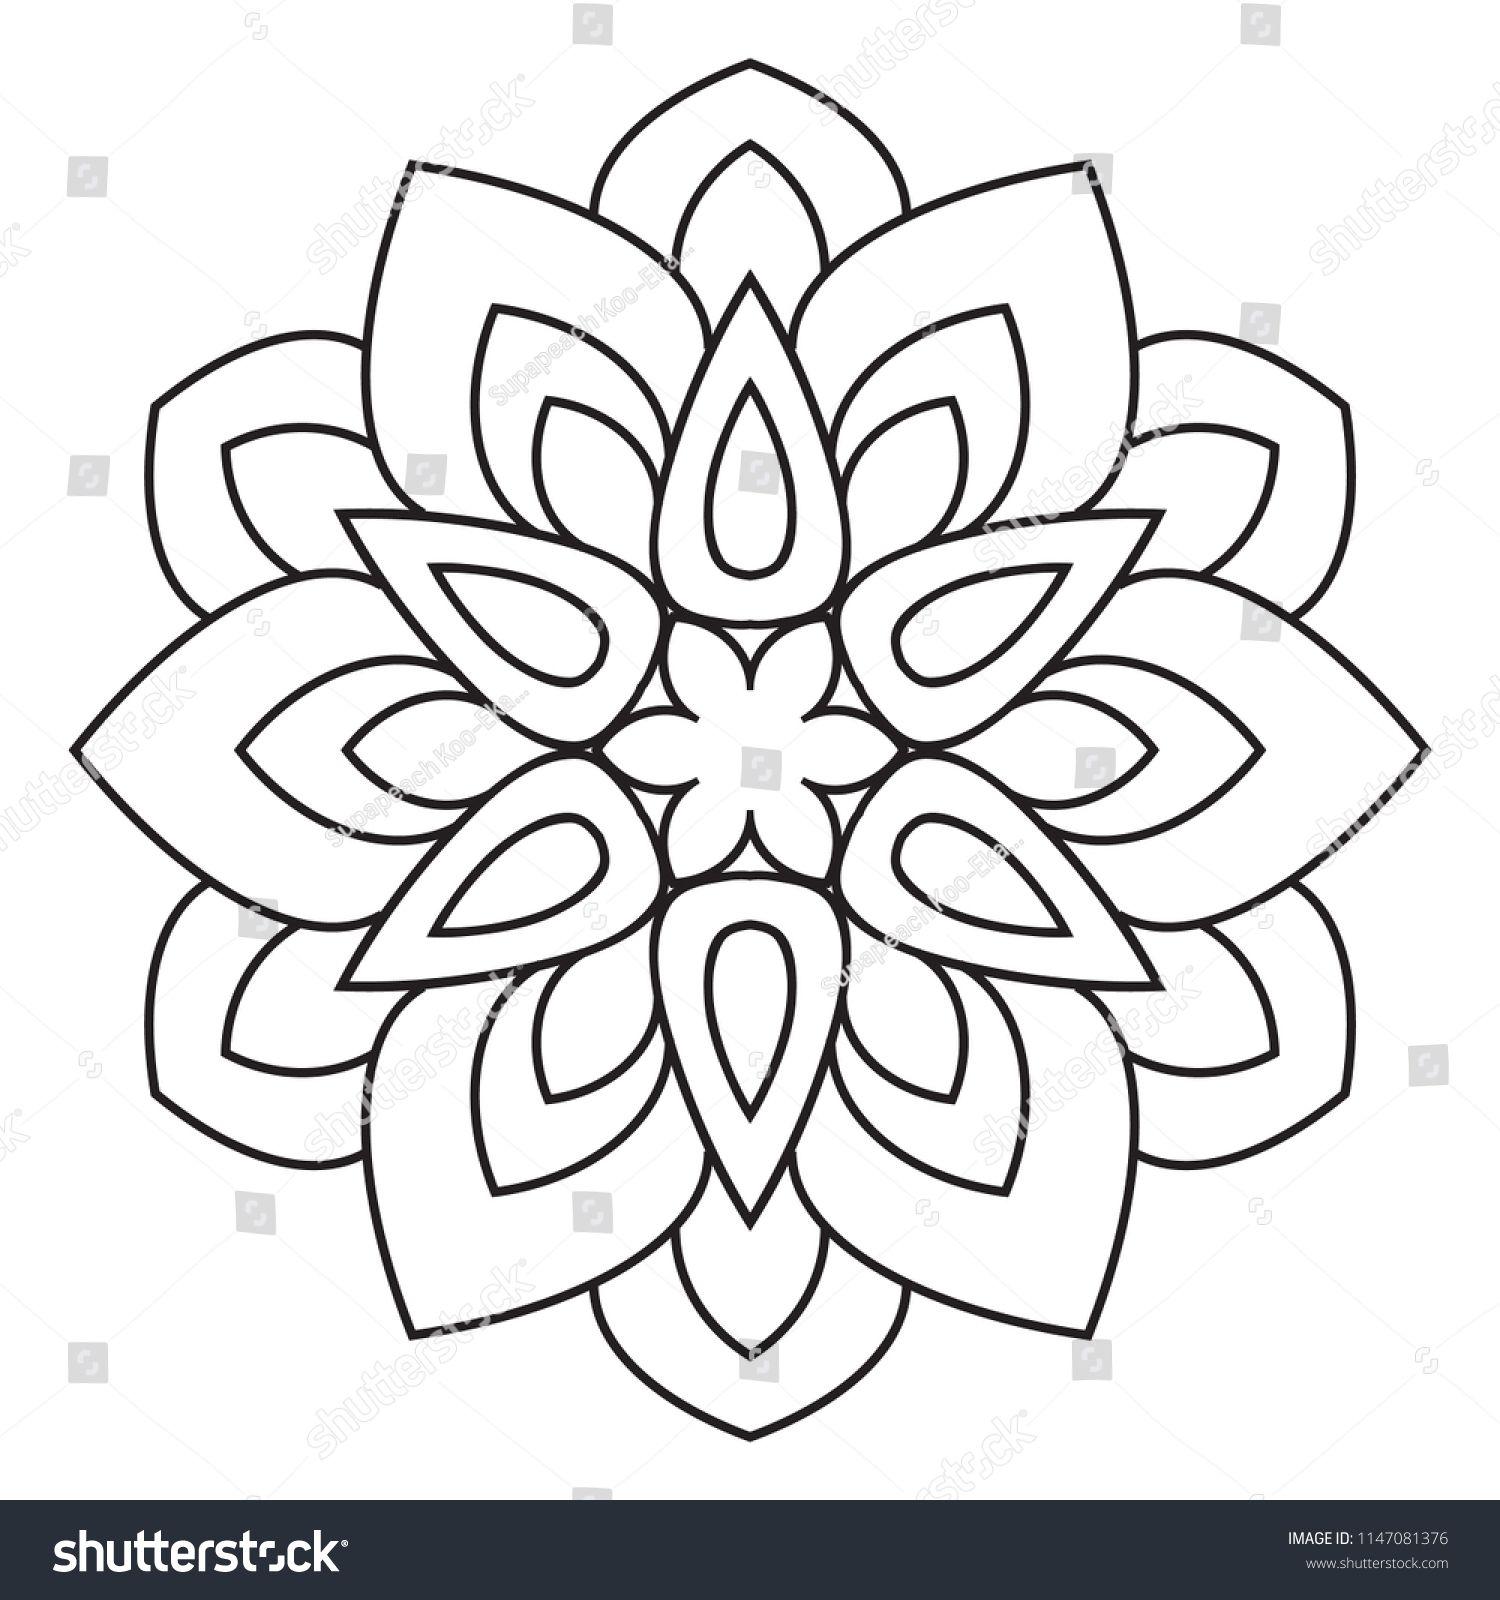 Easy Mandala Basic And Simple Mandalas Coloring Book For Adults Seniors And Beginner Mandalas Fl Simple Mandala Mandala Coloring Pages Easy Mandala Drawing